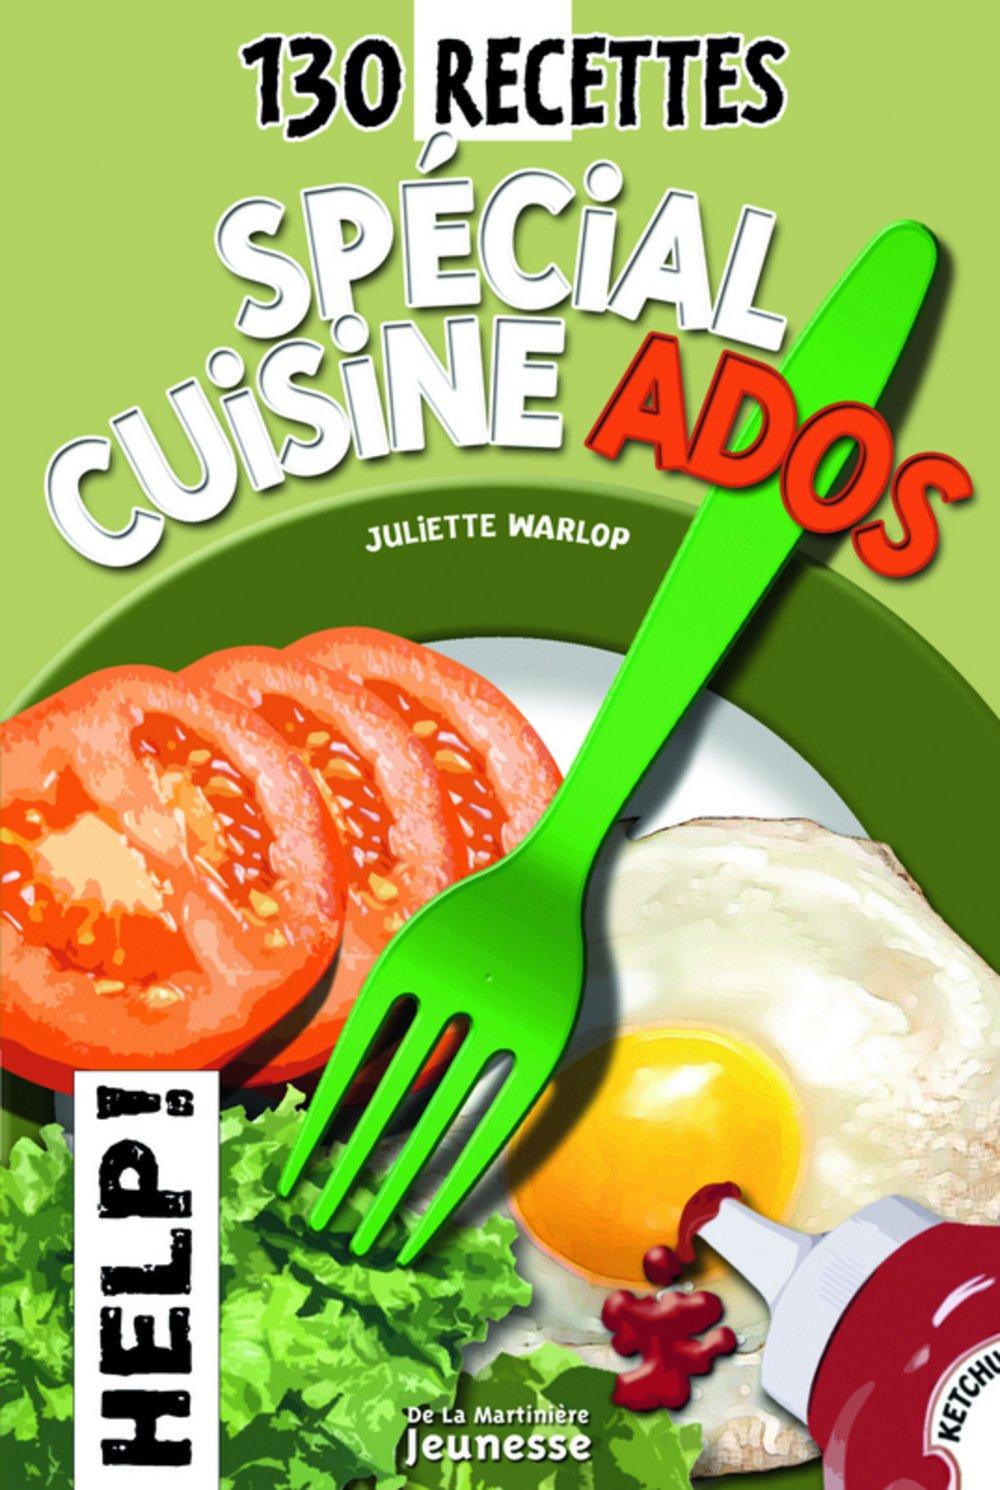 130 Recettes Special Cuisine Ados Juliette Warlop